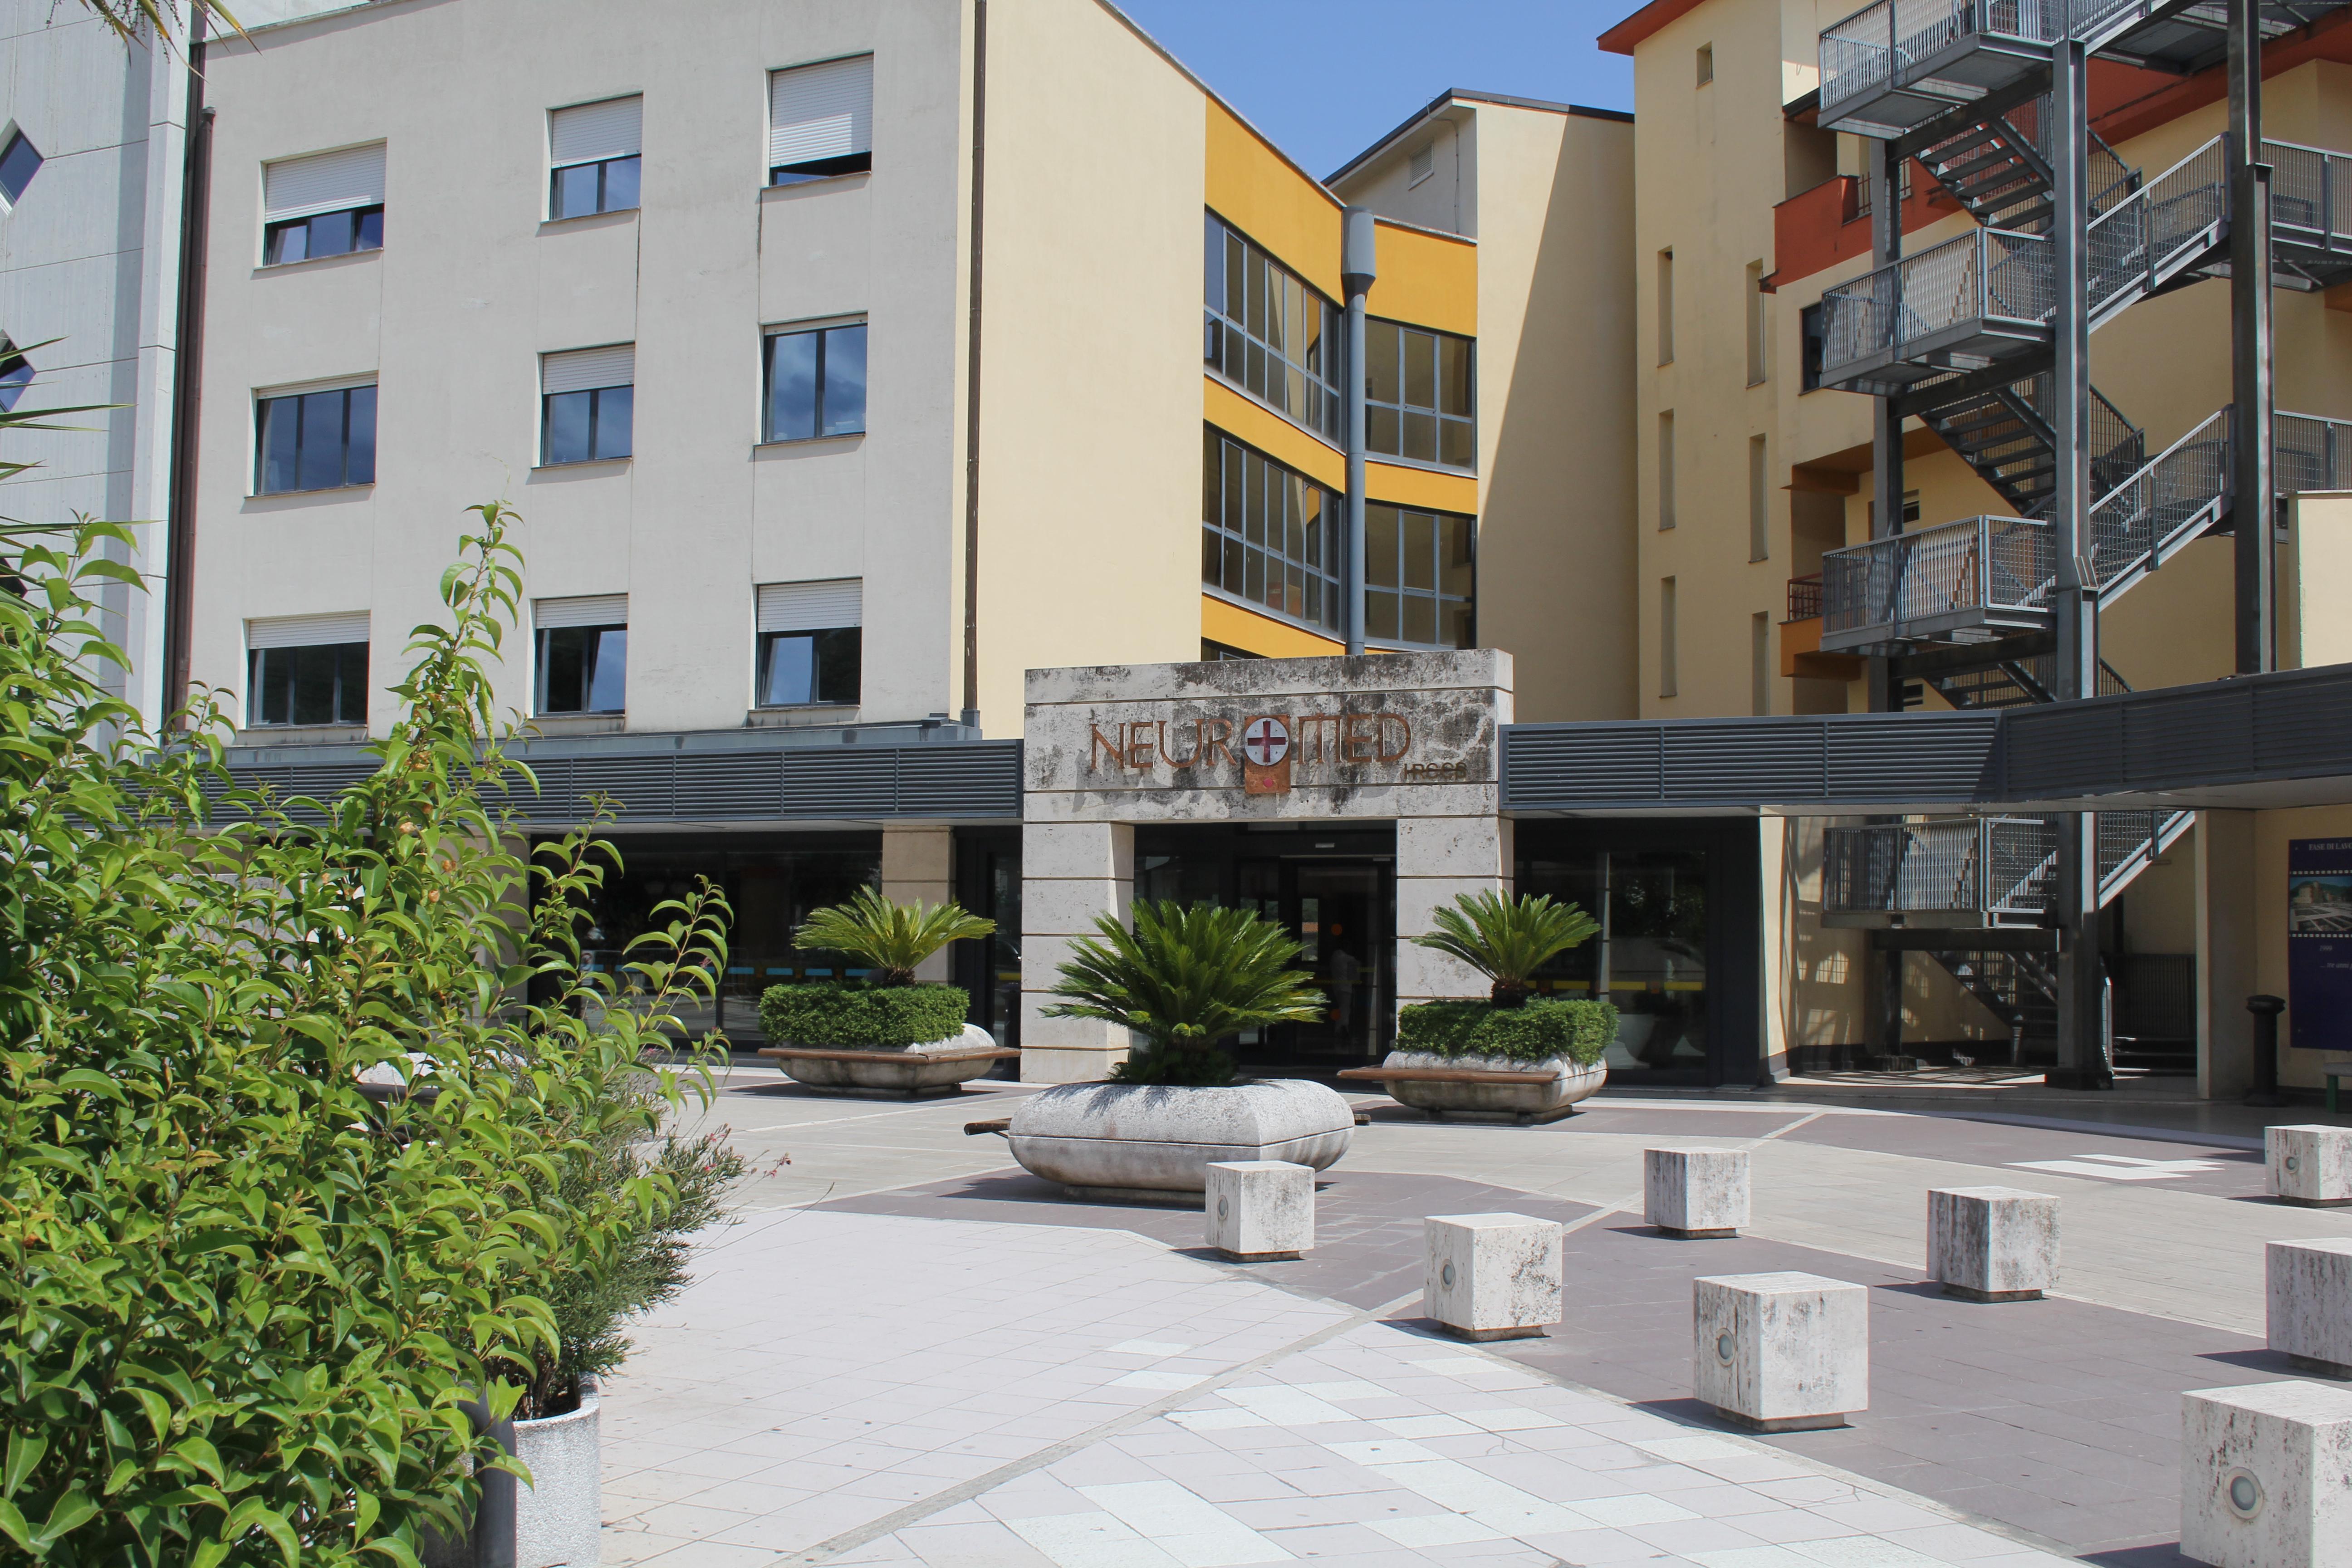 esterno-clinica-ingresso-1